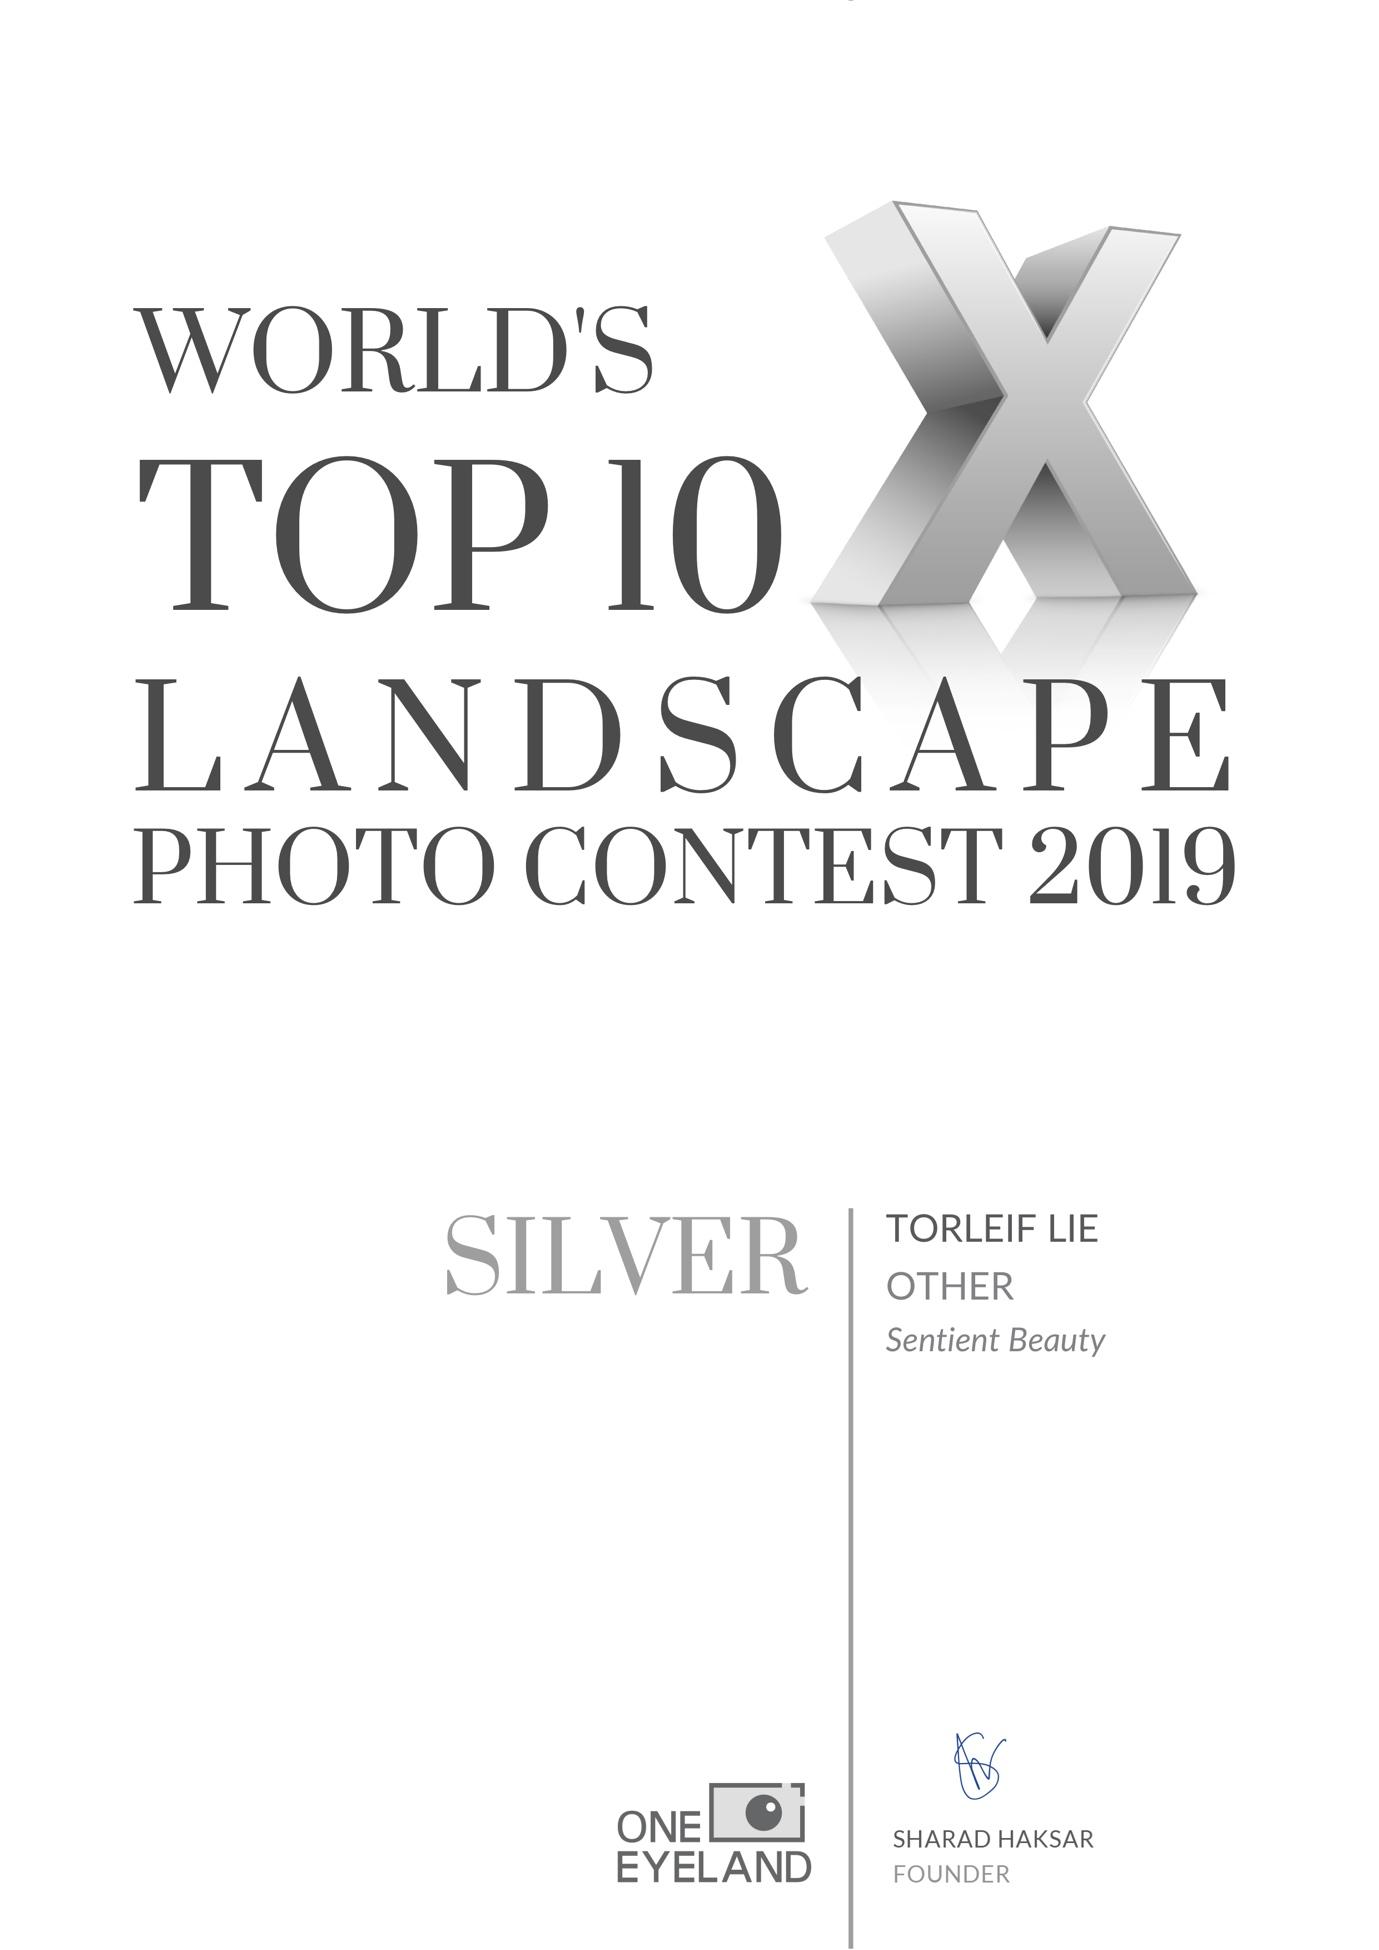 Sentient-Beauty-silver-landscape-other--2019